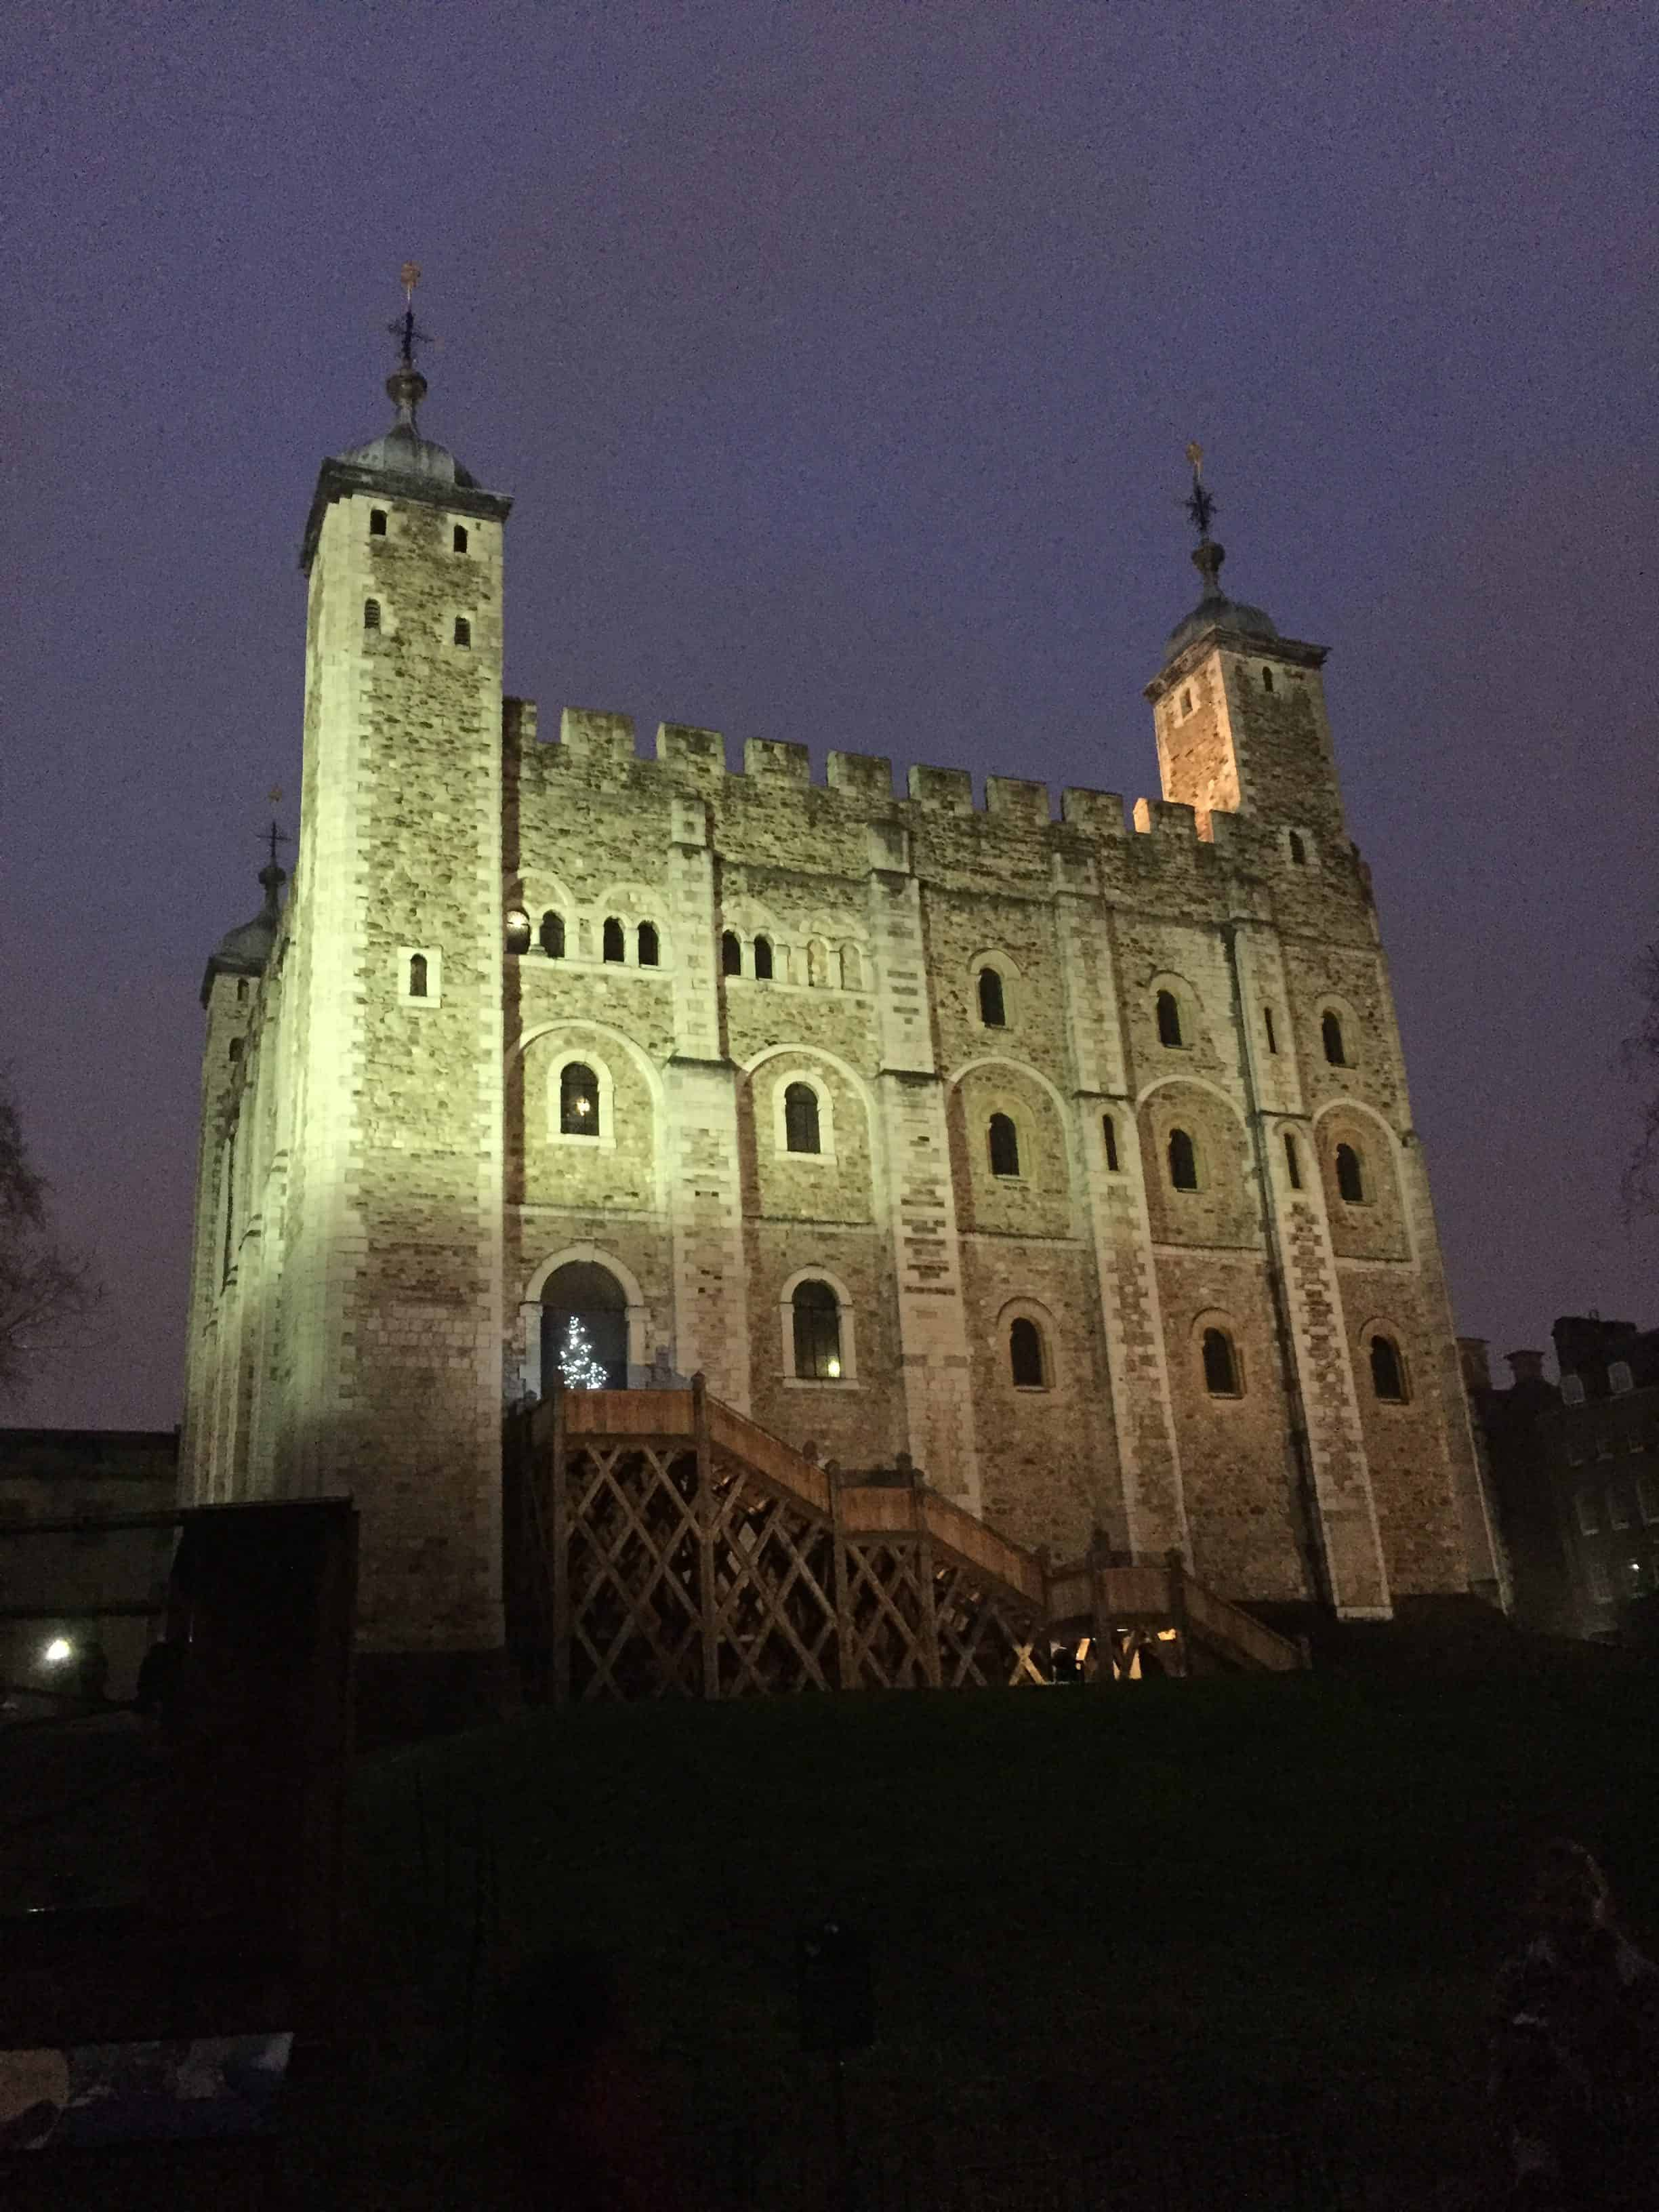 Tower of London night